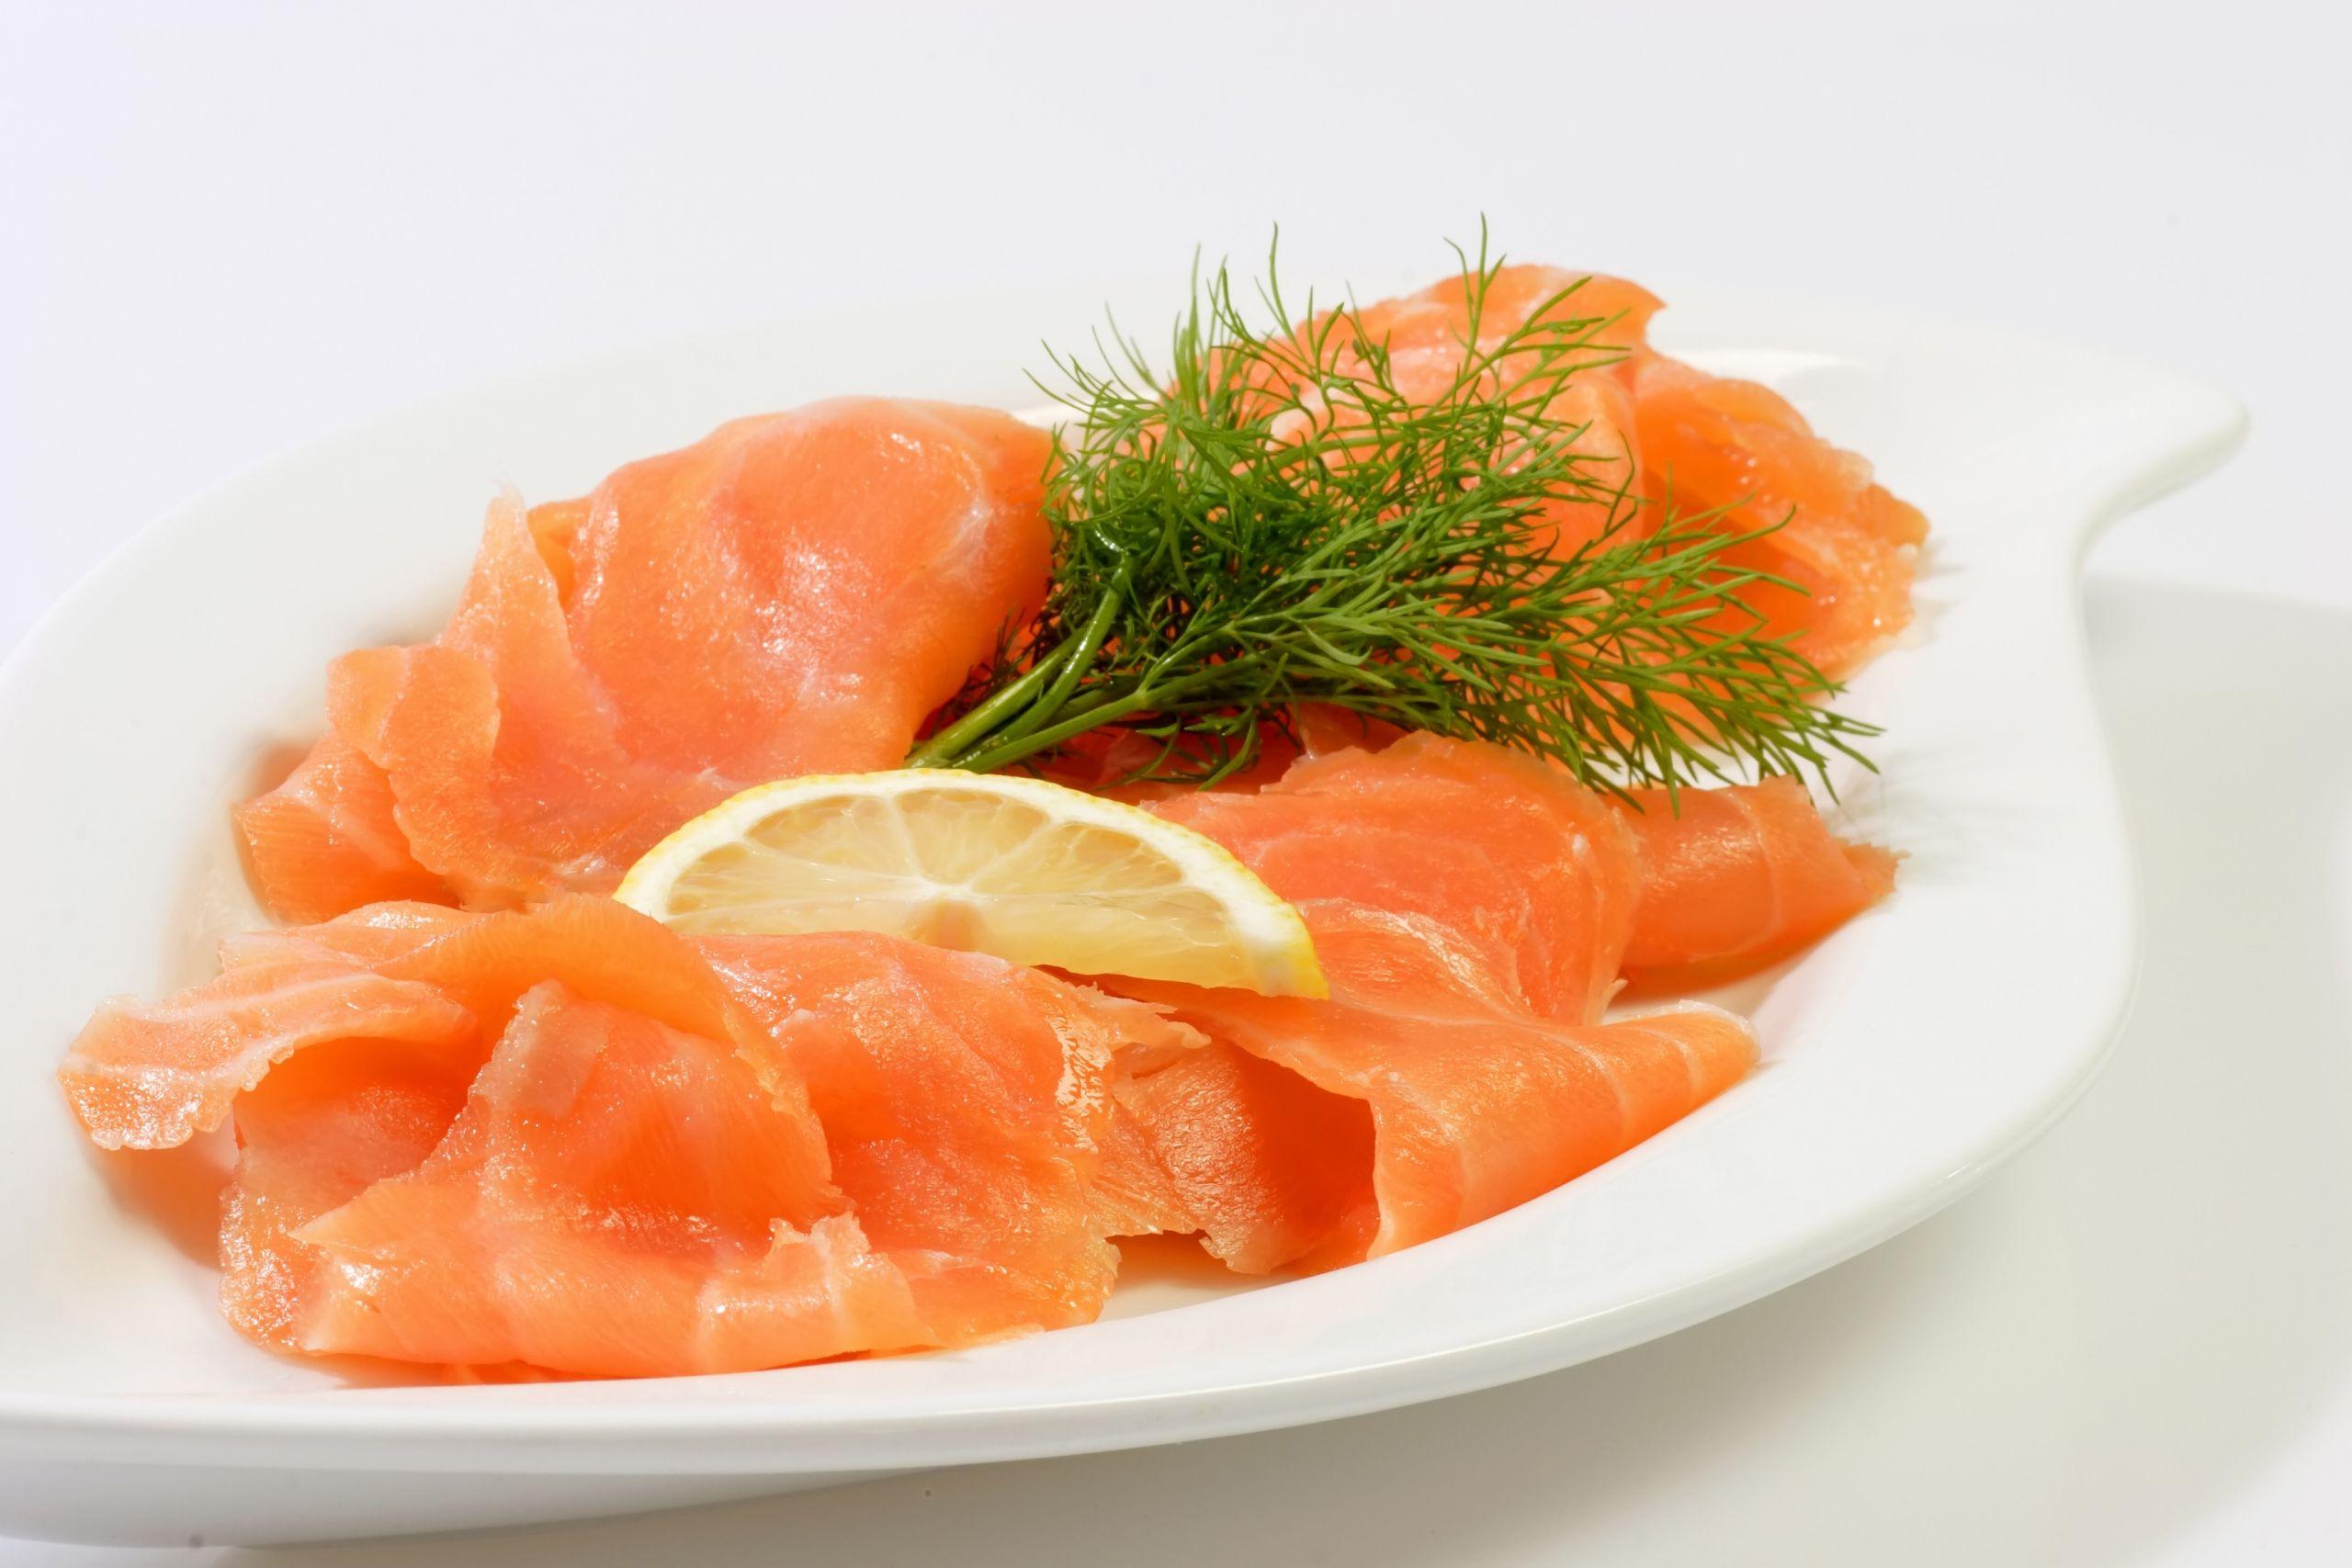 Smoked Salmon Brands  Oldest smoked salmon brand on cusp of 'protected' status